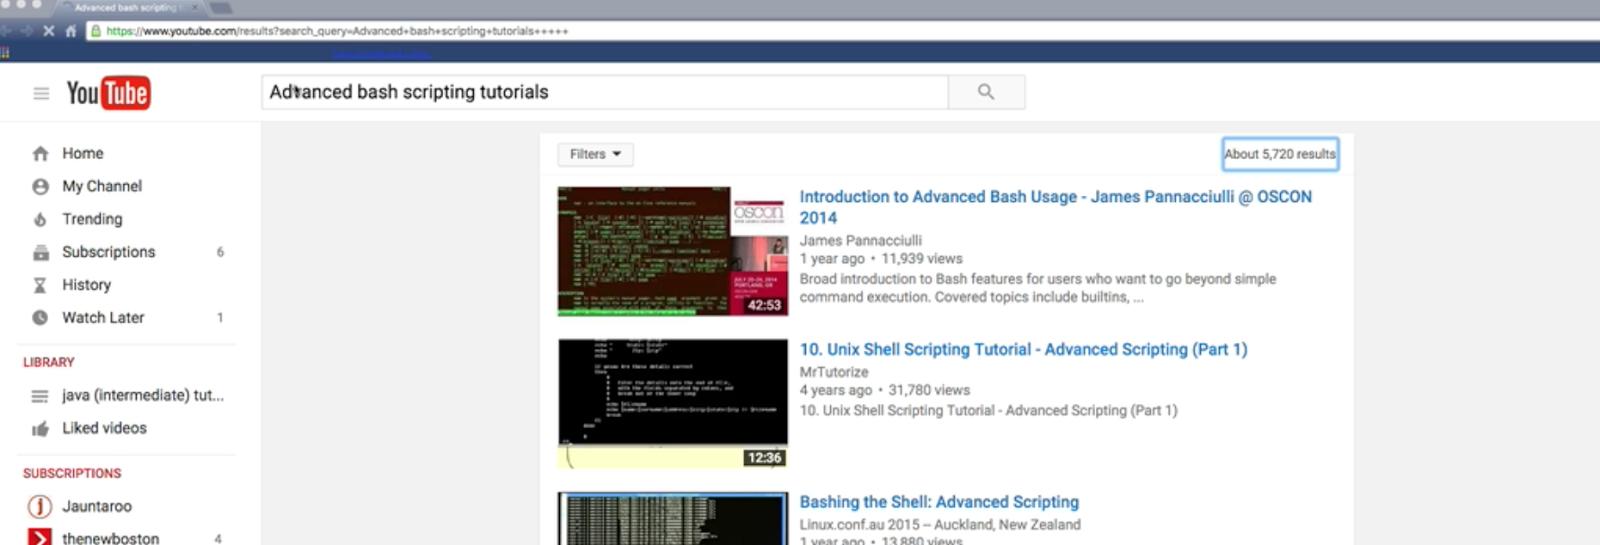 Unix Shell Scripting Tutorial Youtube Shell Scripting Tutorial for